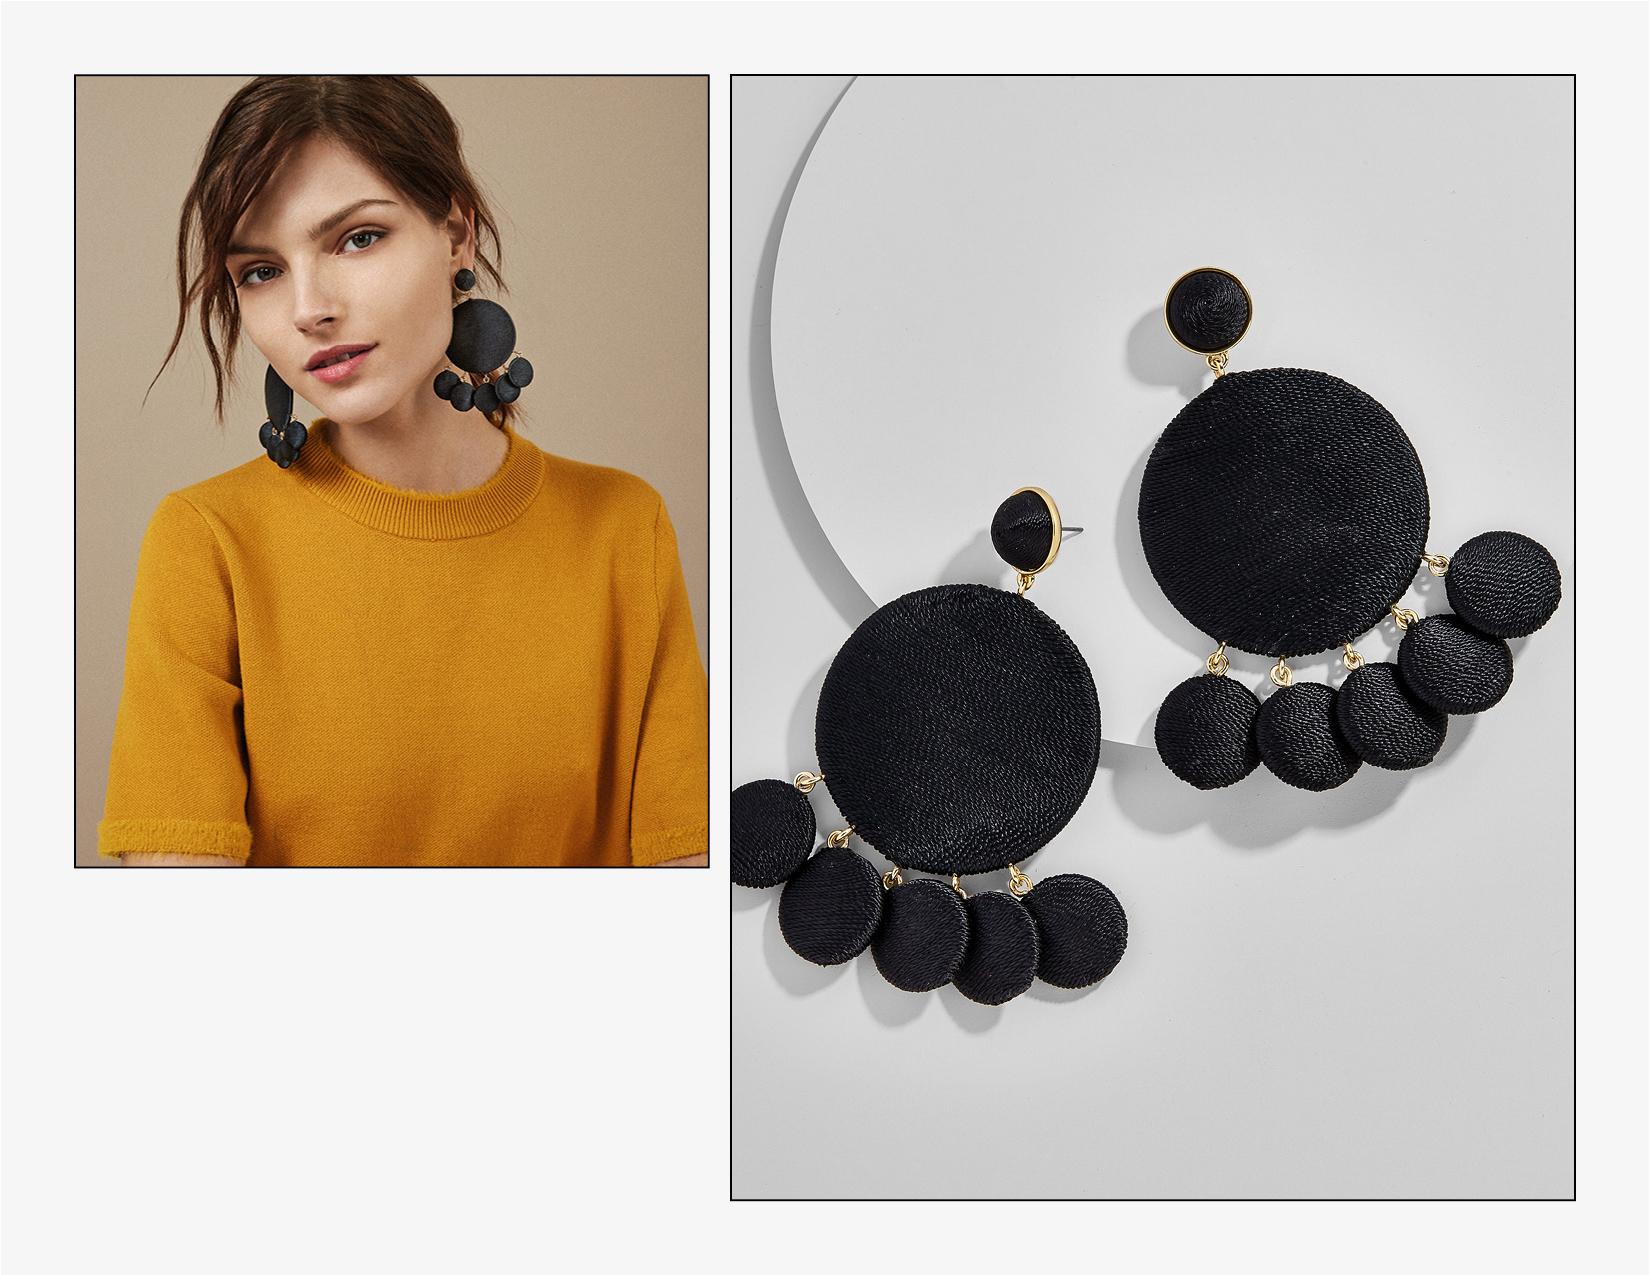 jewelry layout4.jpg